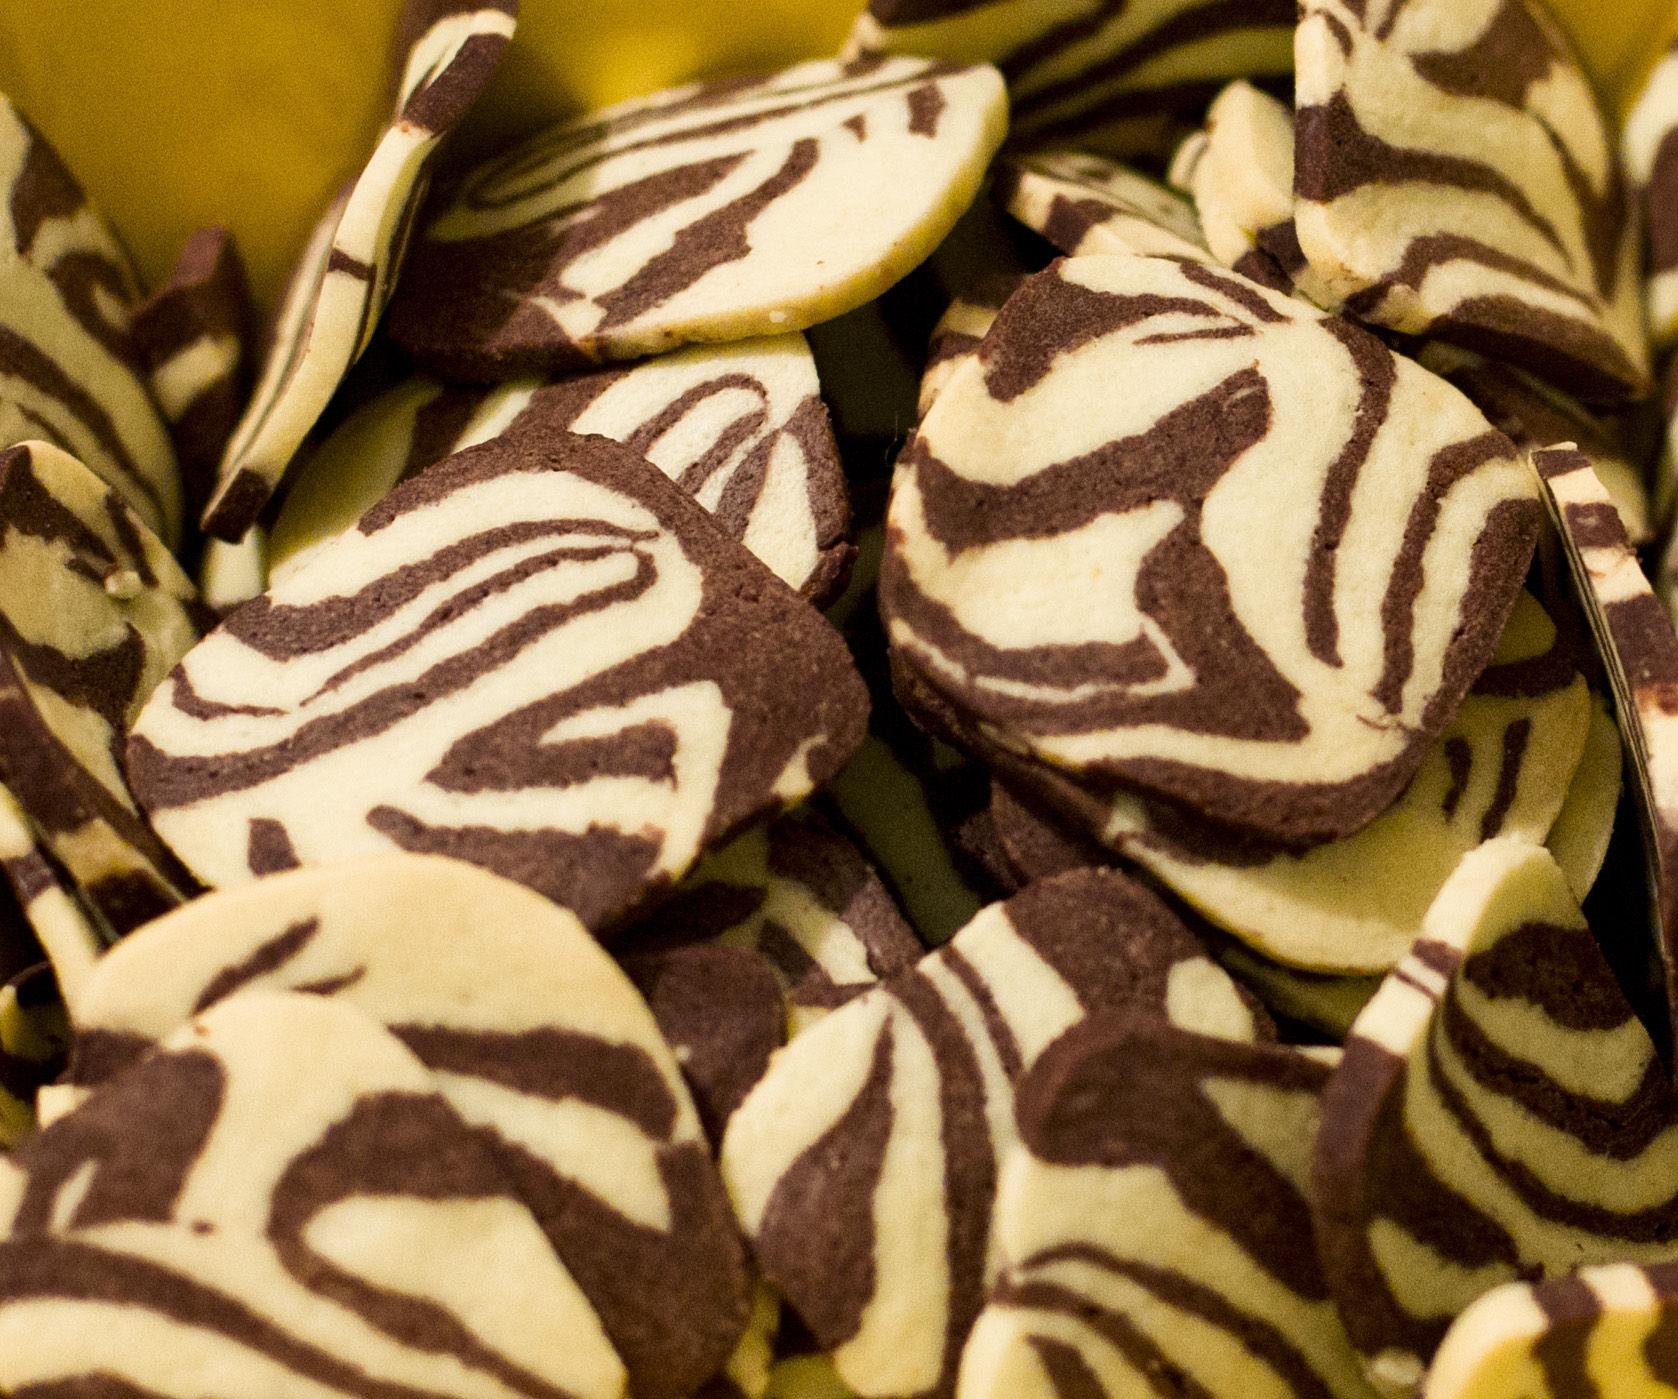 Zebra cookie